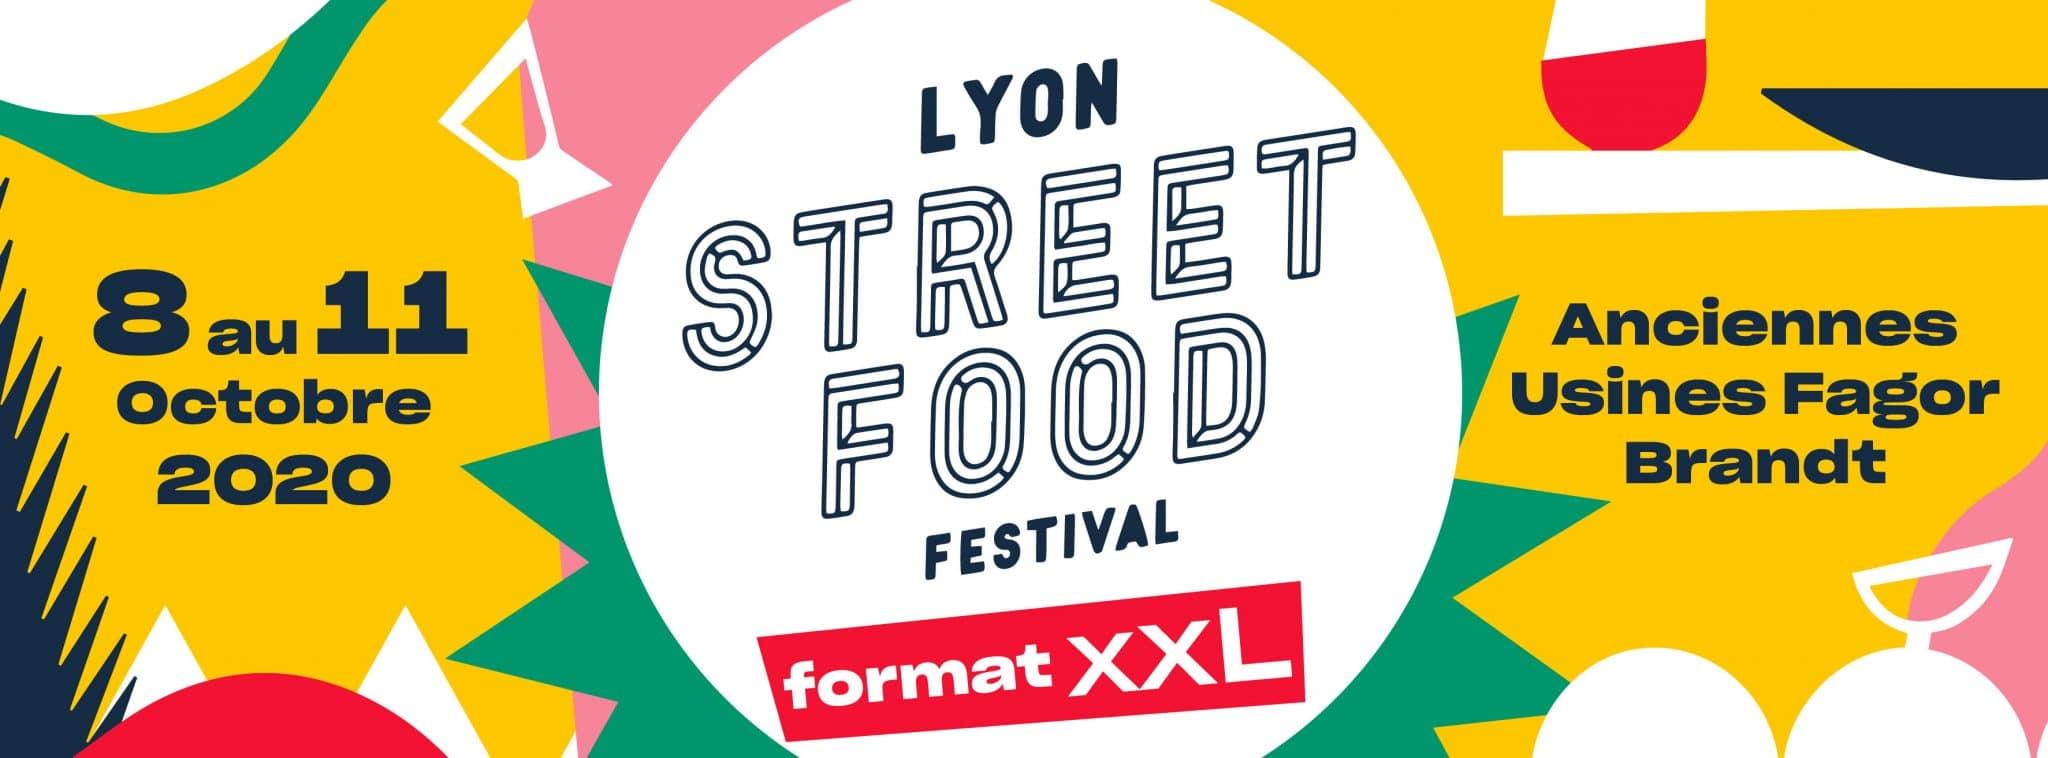 couv-lyon-street-food-festival-2020-01